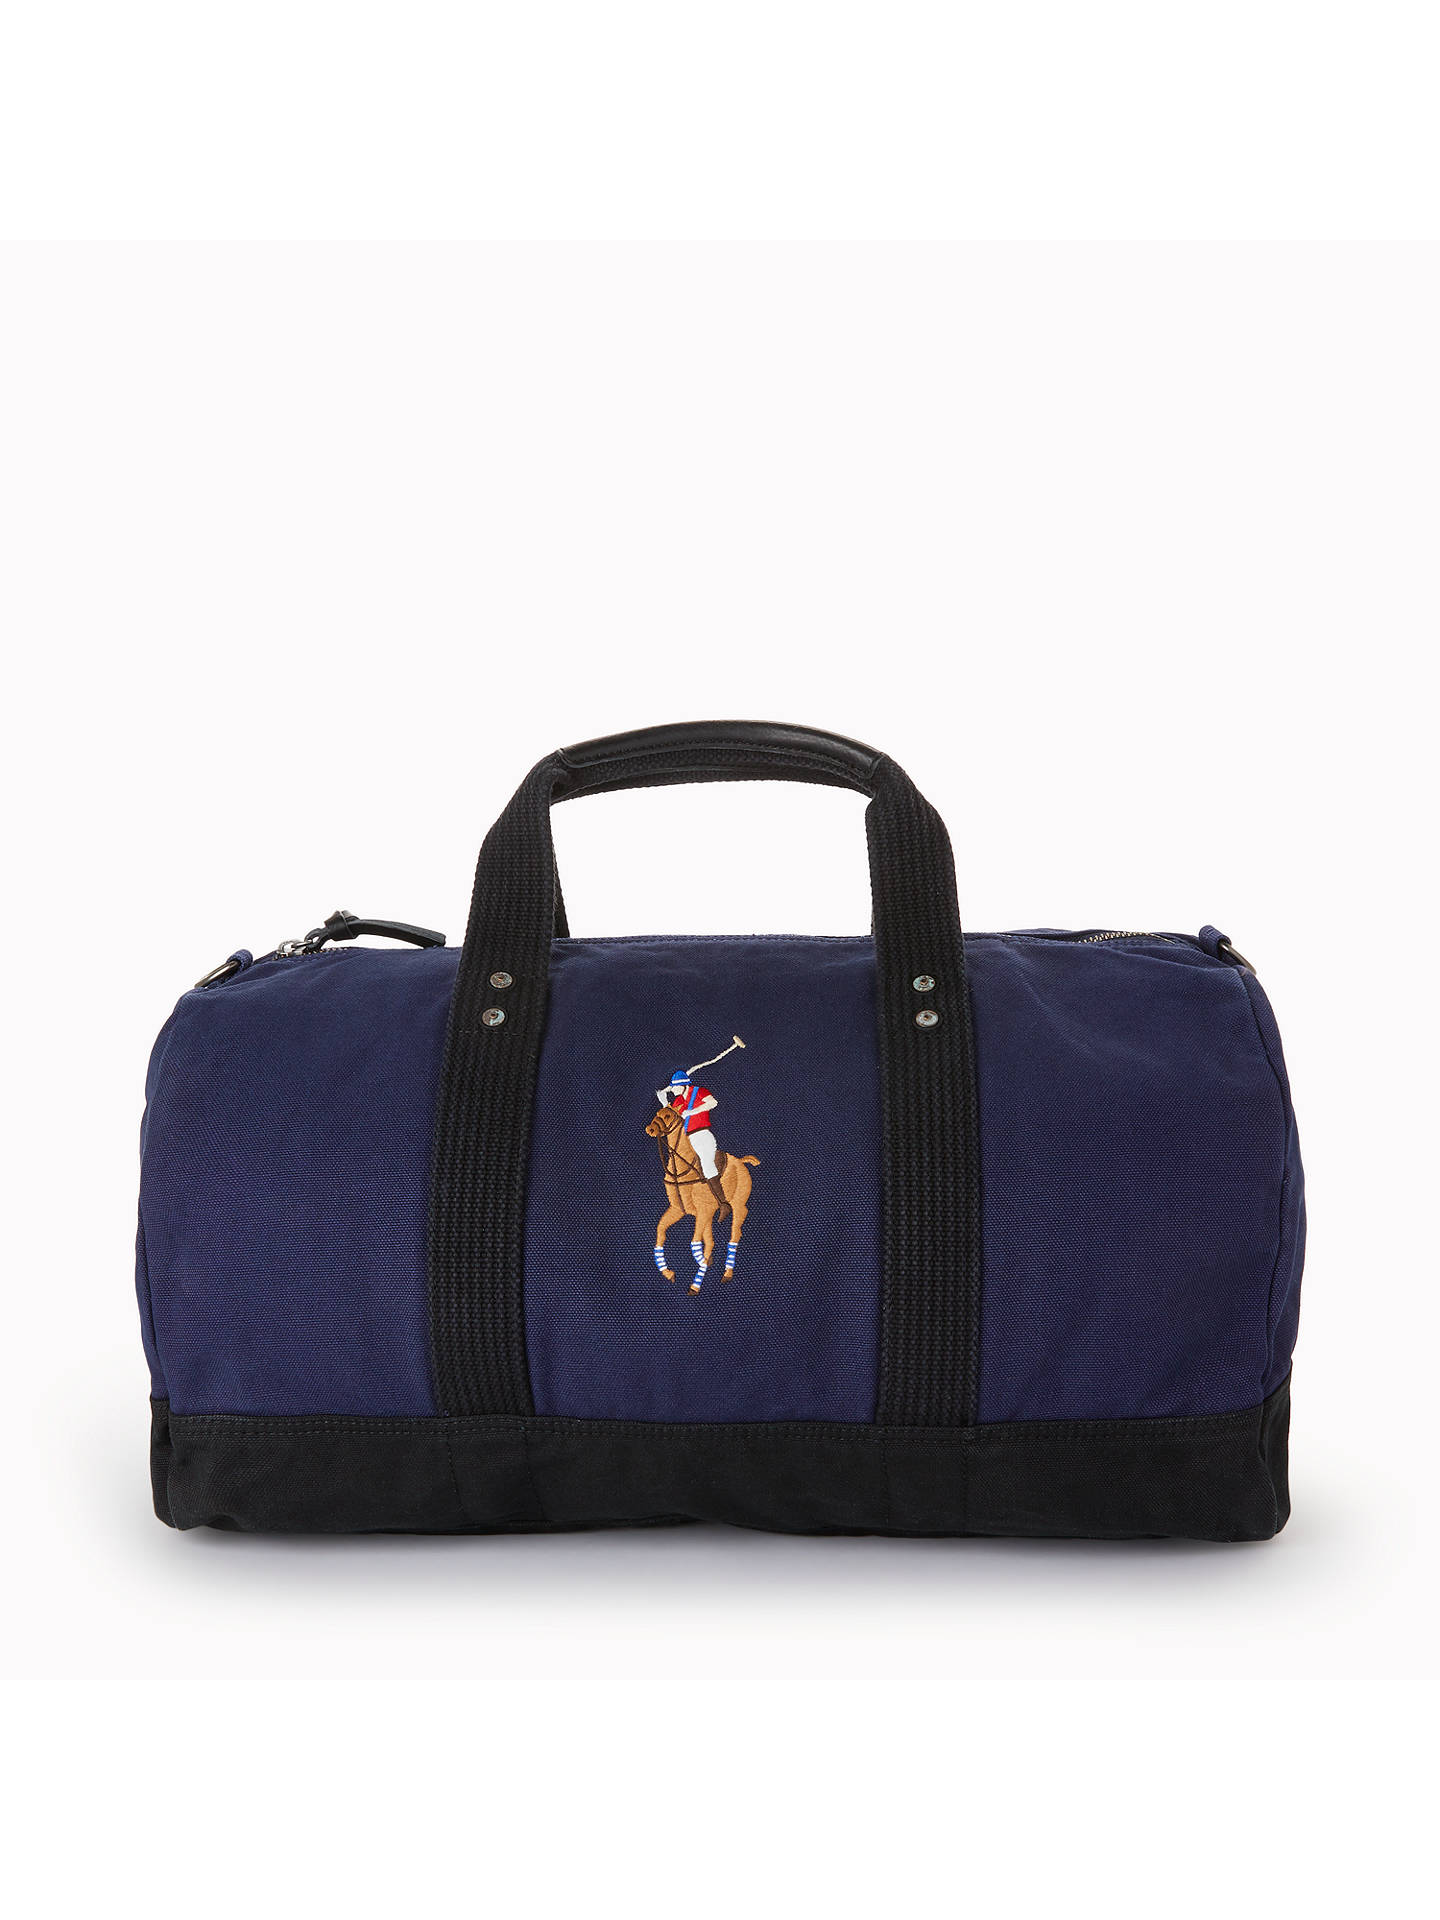 48680b65c066 BuyPolo Ralph Lauren Canvas Big Pony Duffle Bag